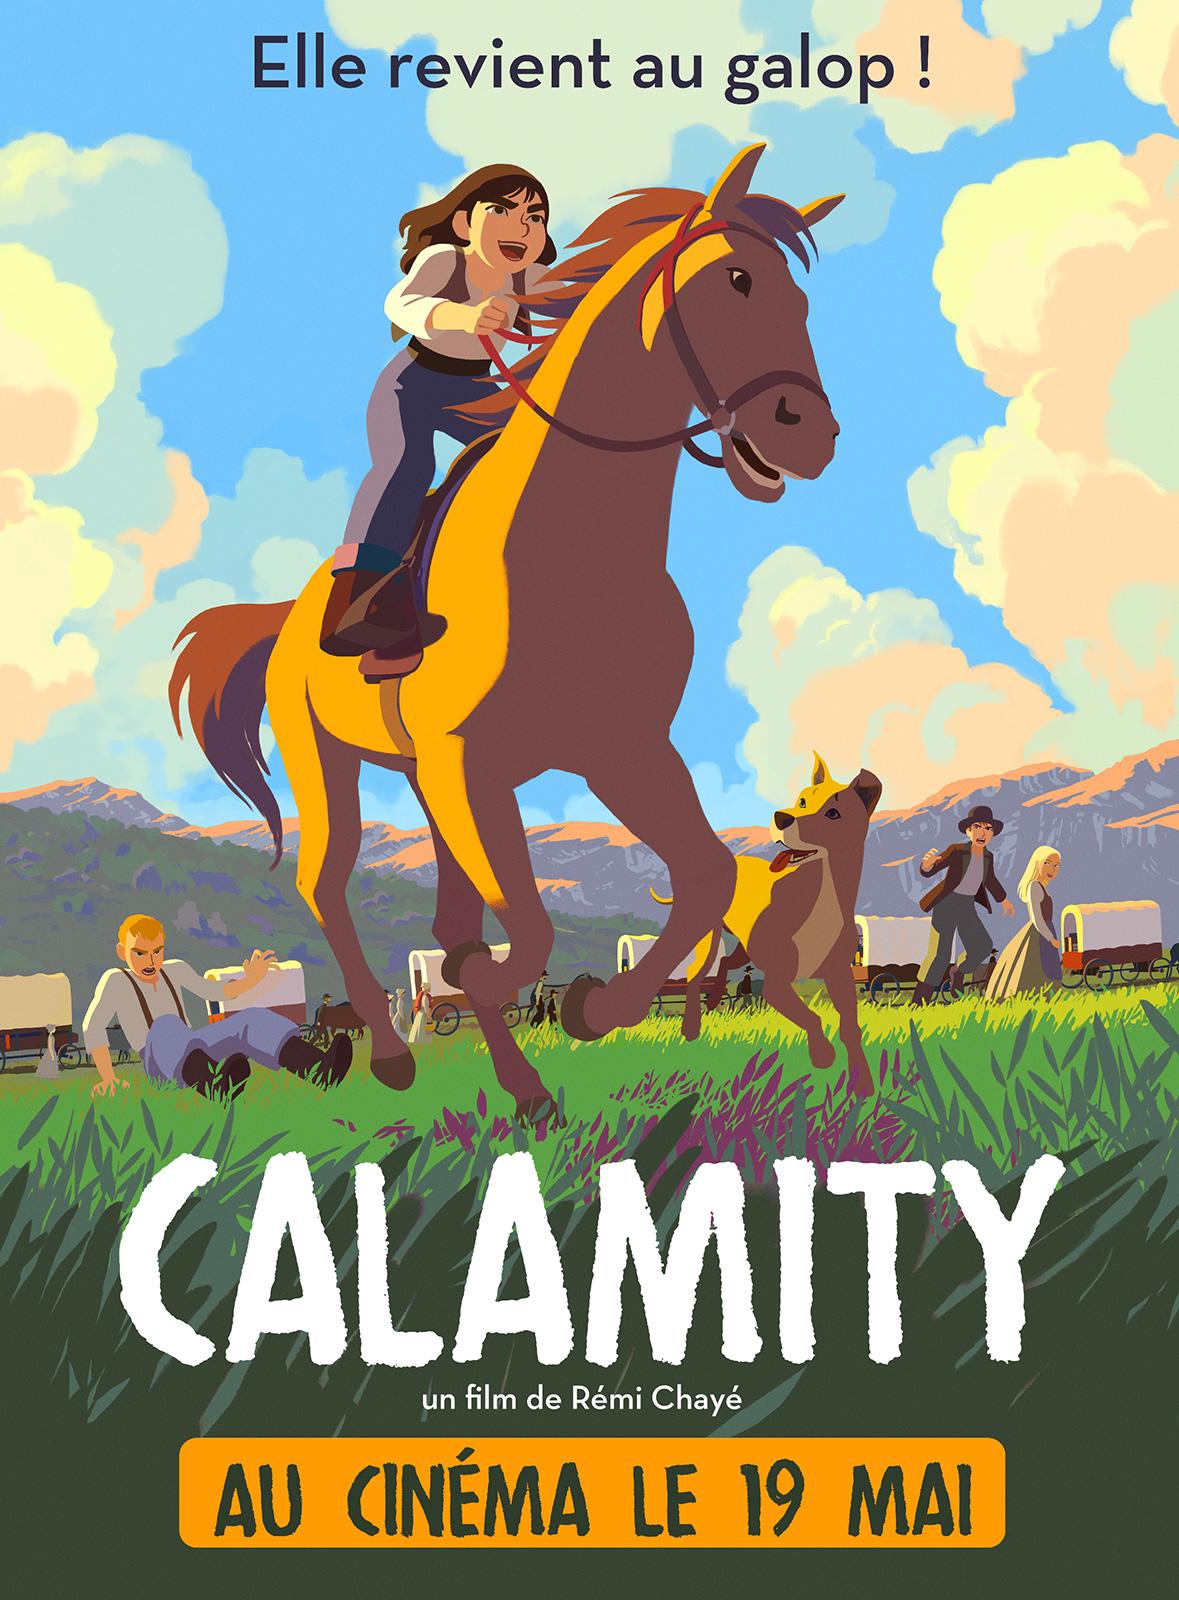 Cinema Le Rabelais - Calamity